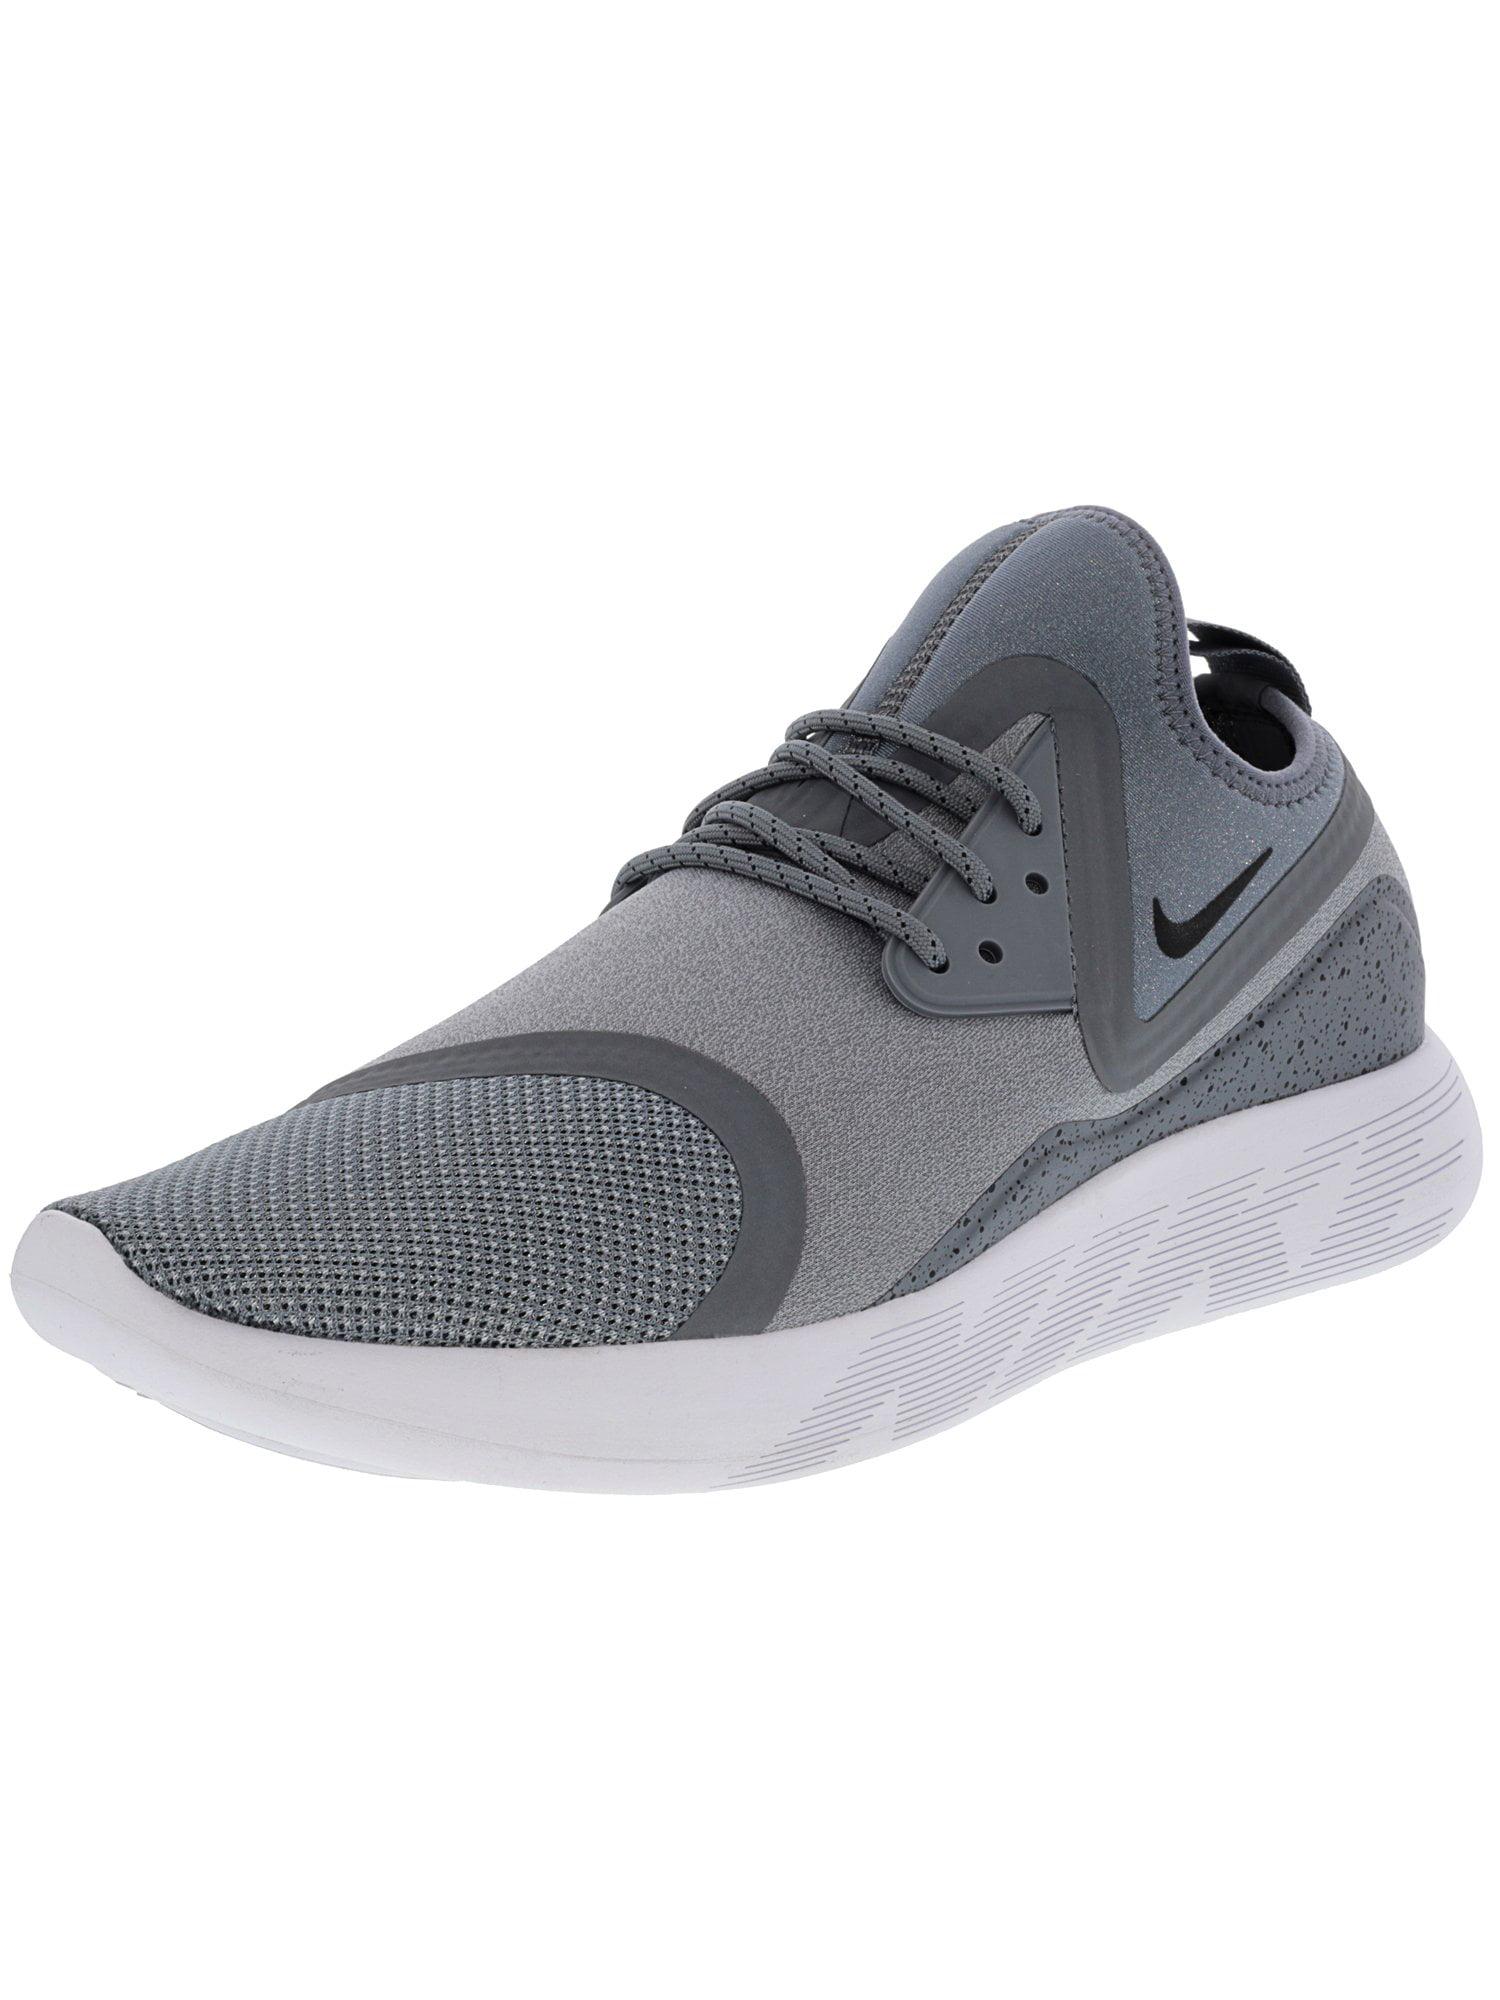 Nike Men's Lunarcharge Essential Black / Dark Obsidian-Volt Ankle-High Fabric Running Shoe - 11.5M